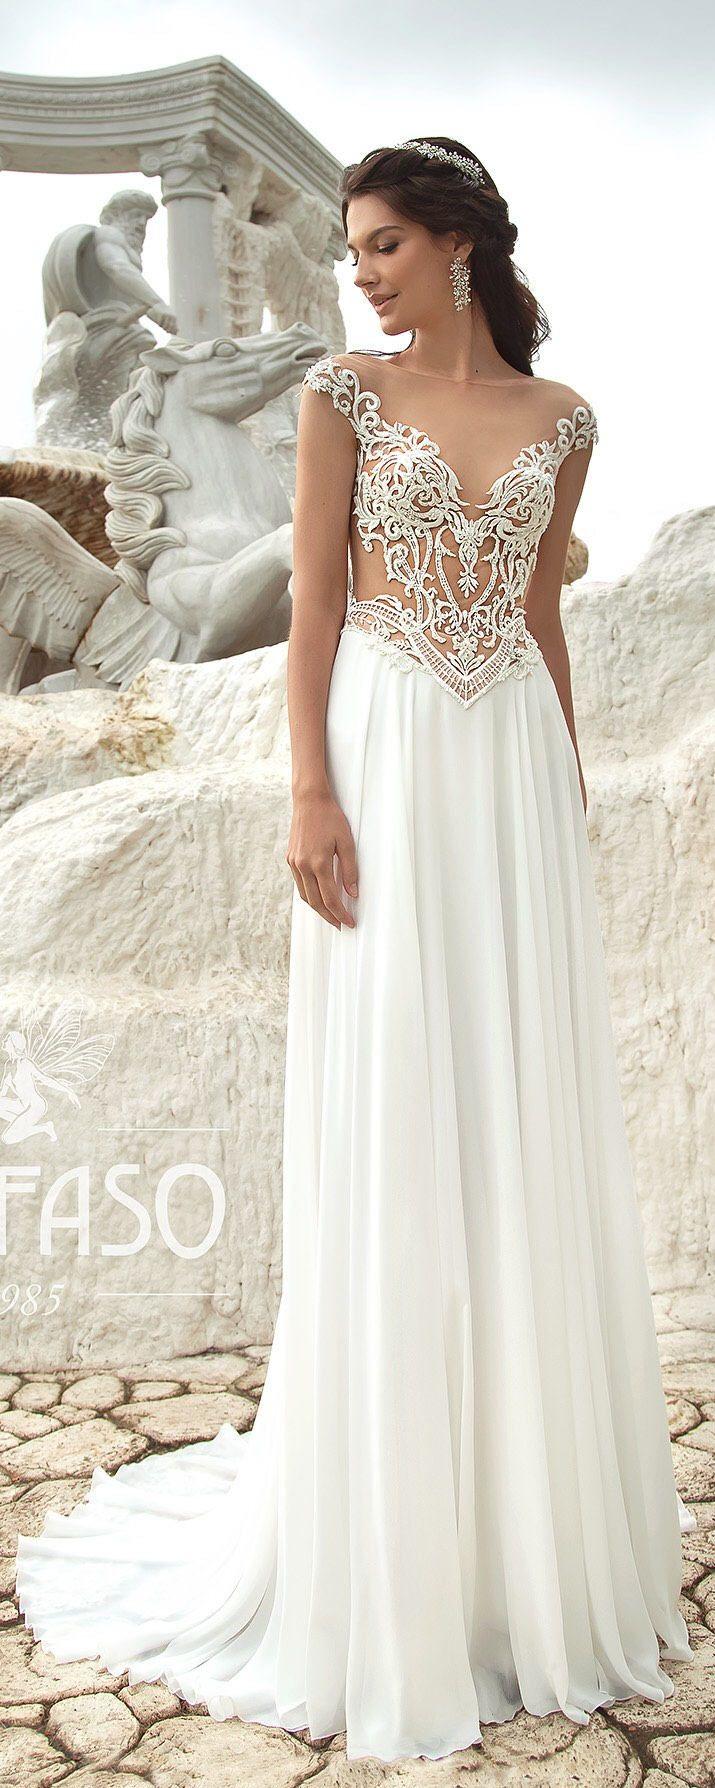 Beach wedding dress backless bridal gown boho lace dress nea